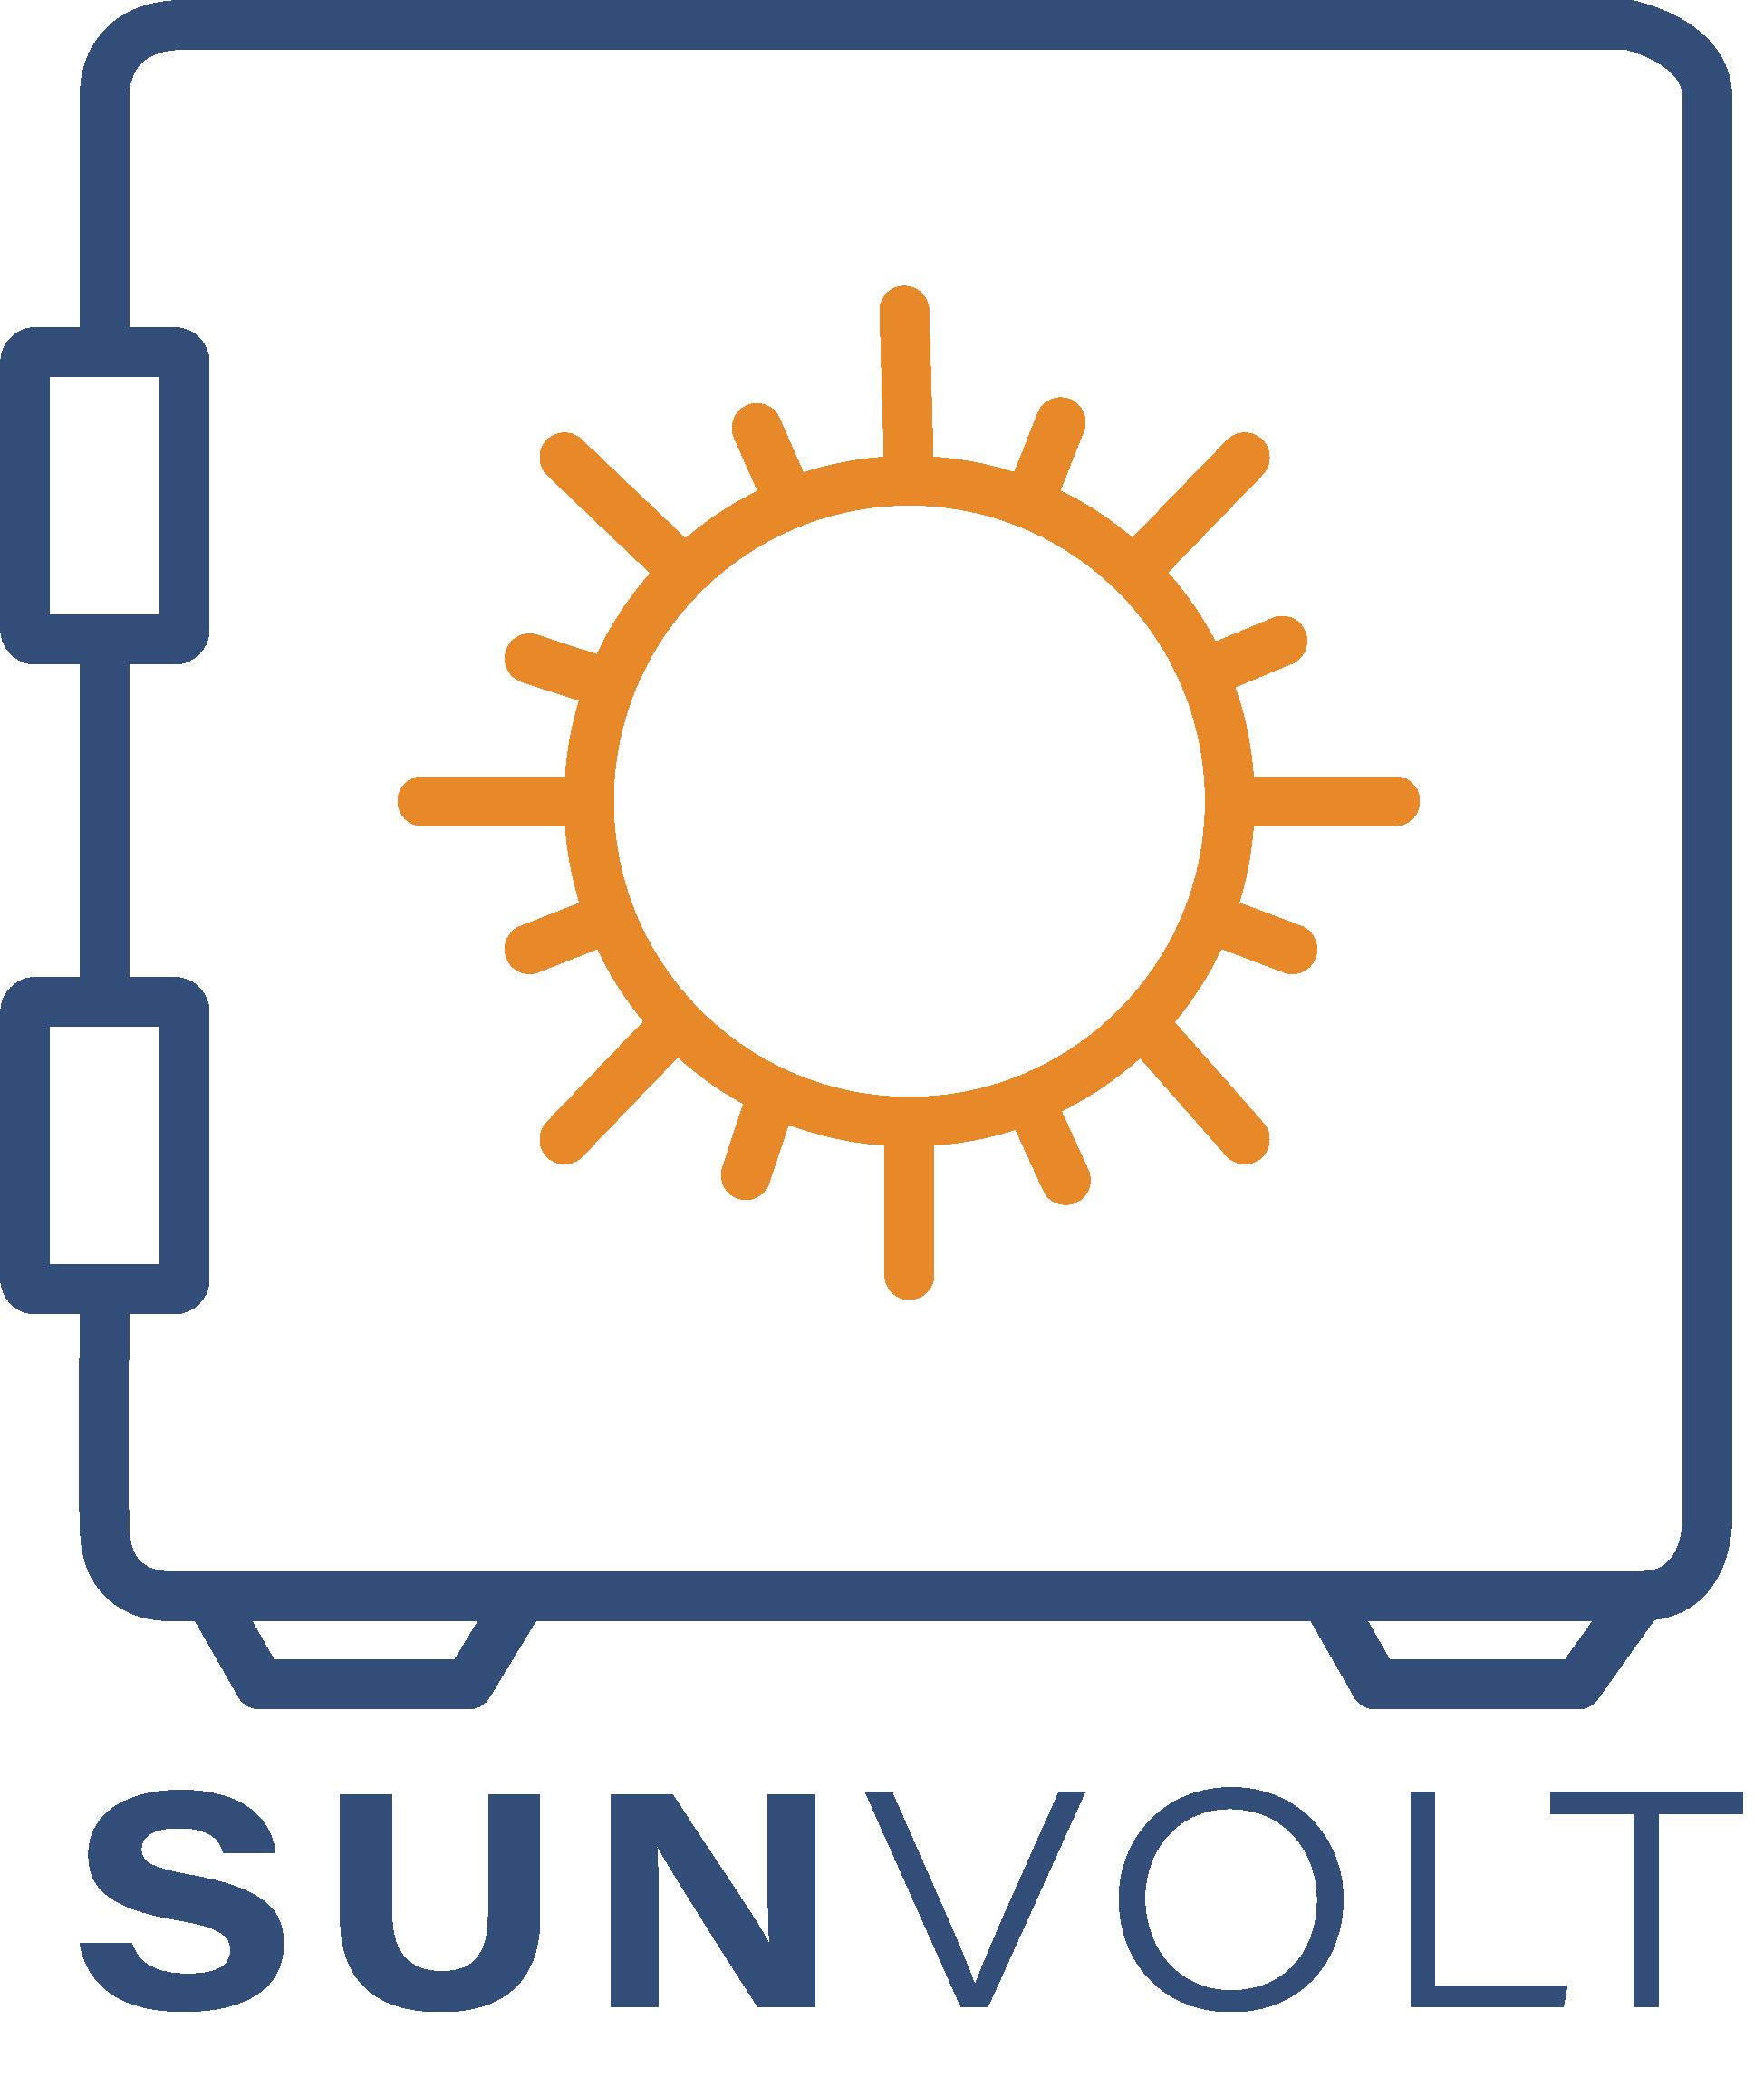 Sunvolt Logo